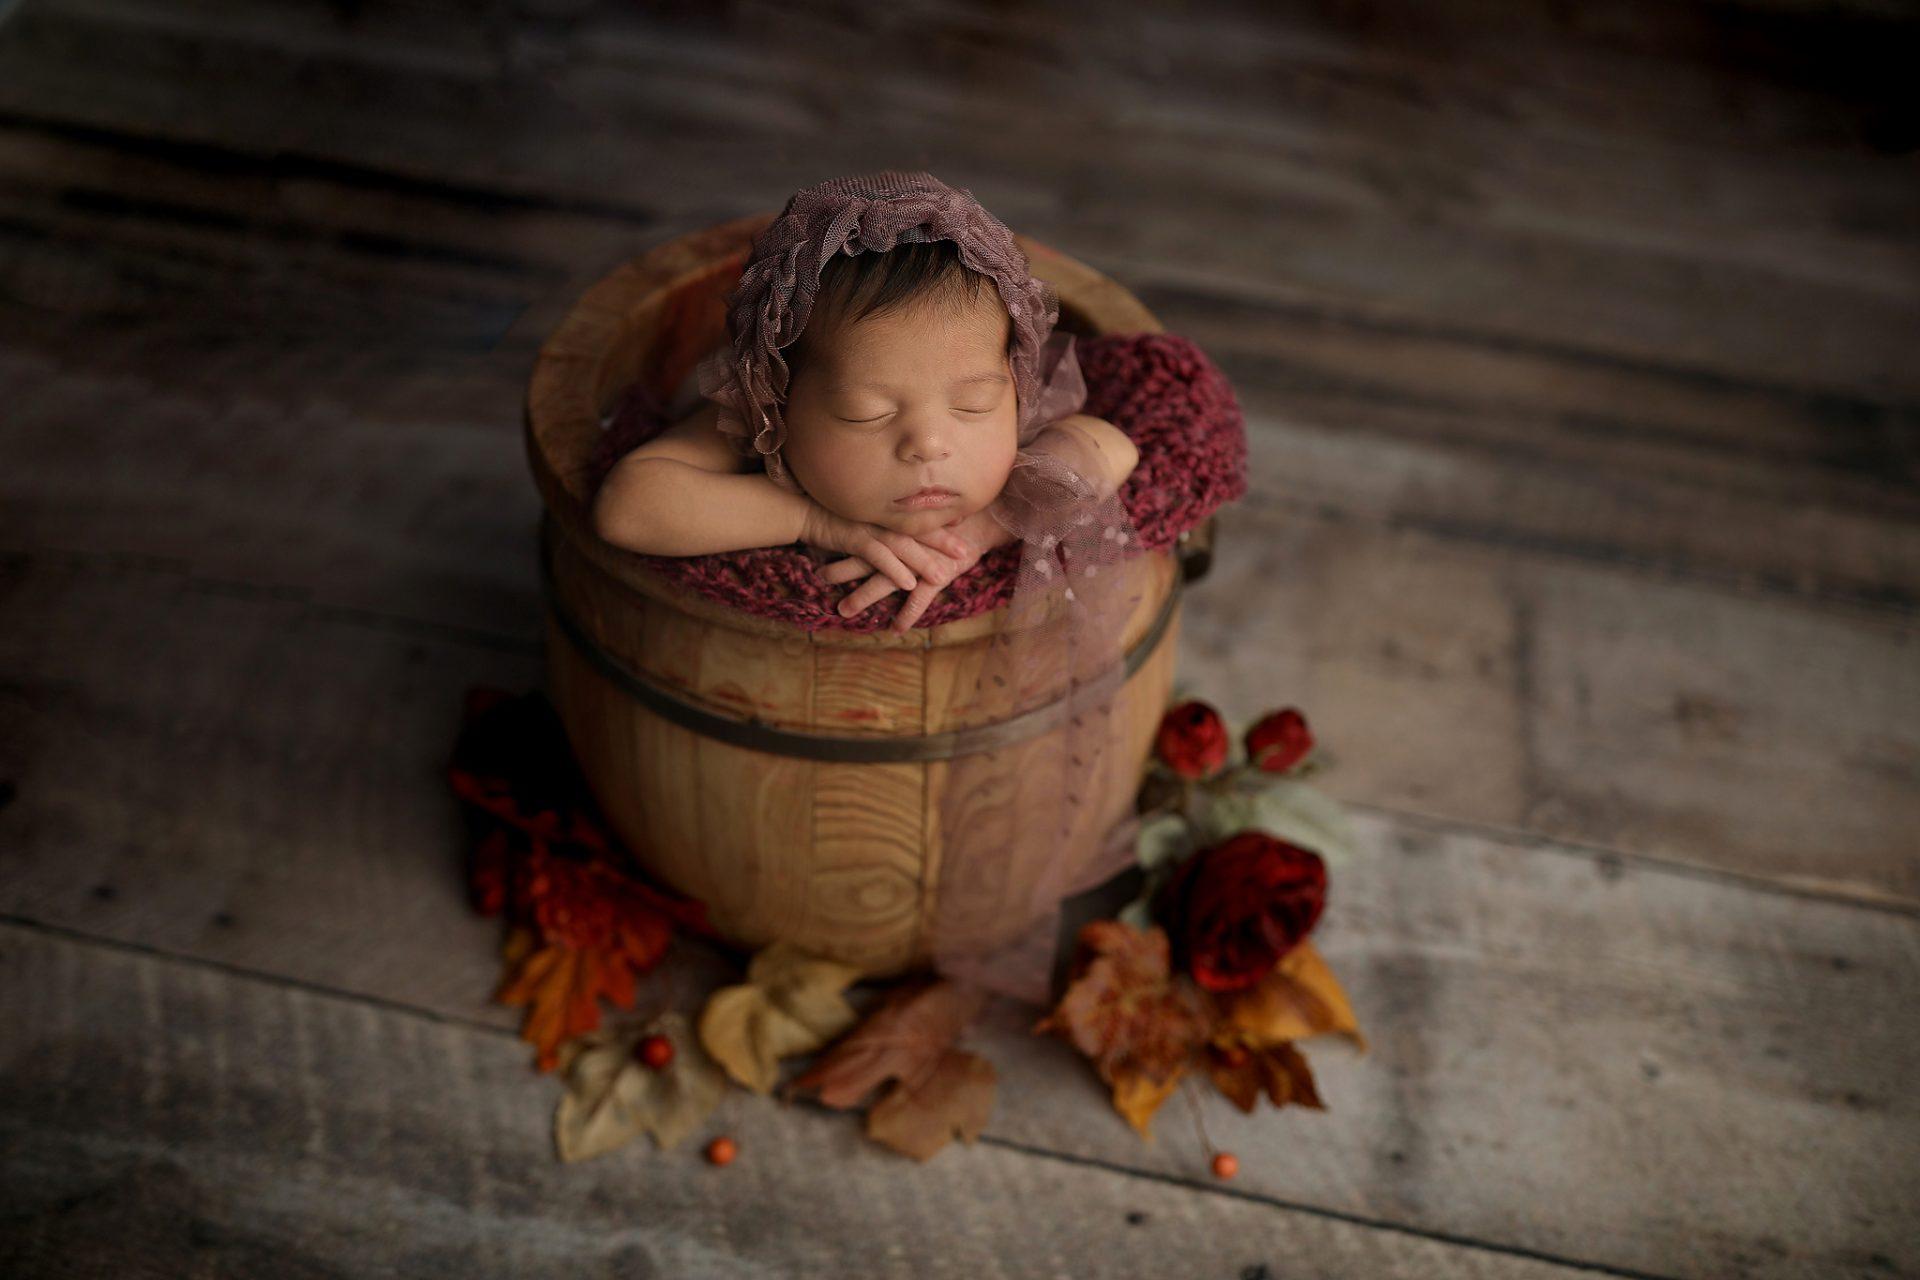 Tucson Baby In bucket